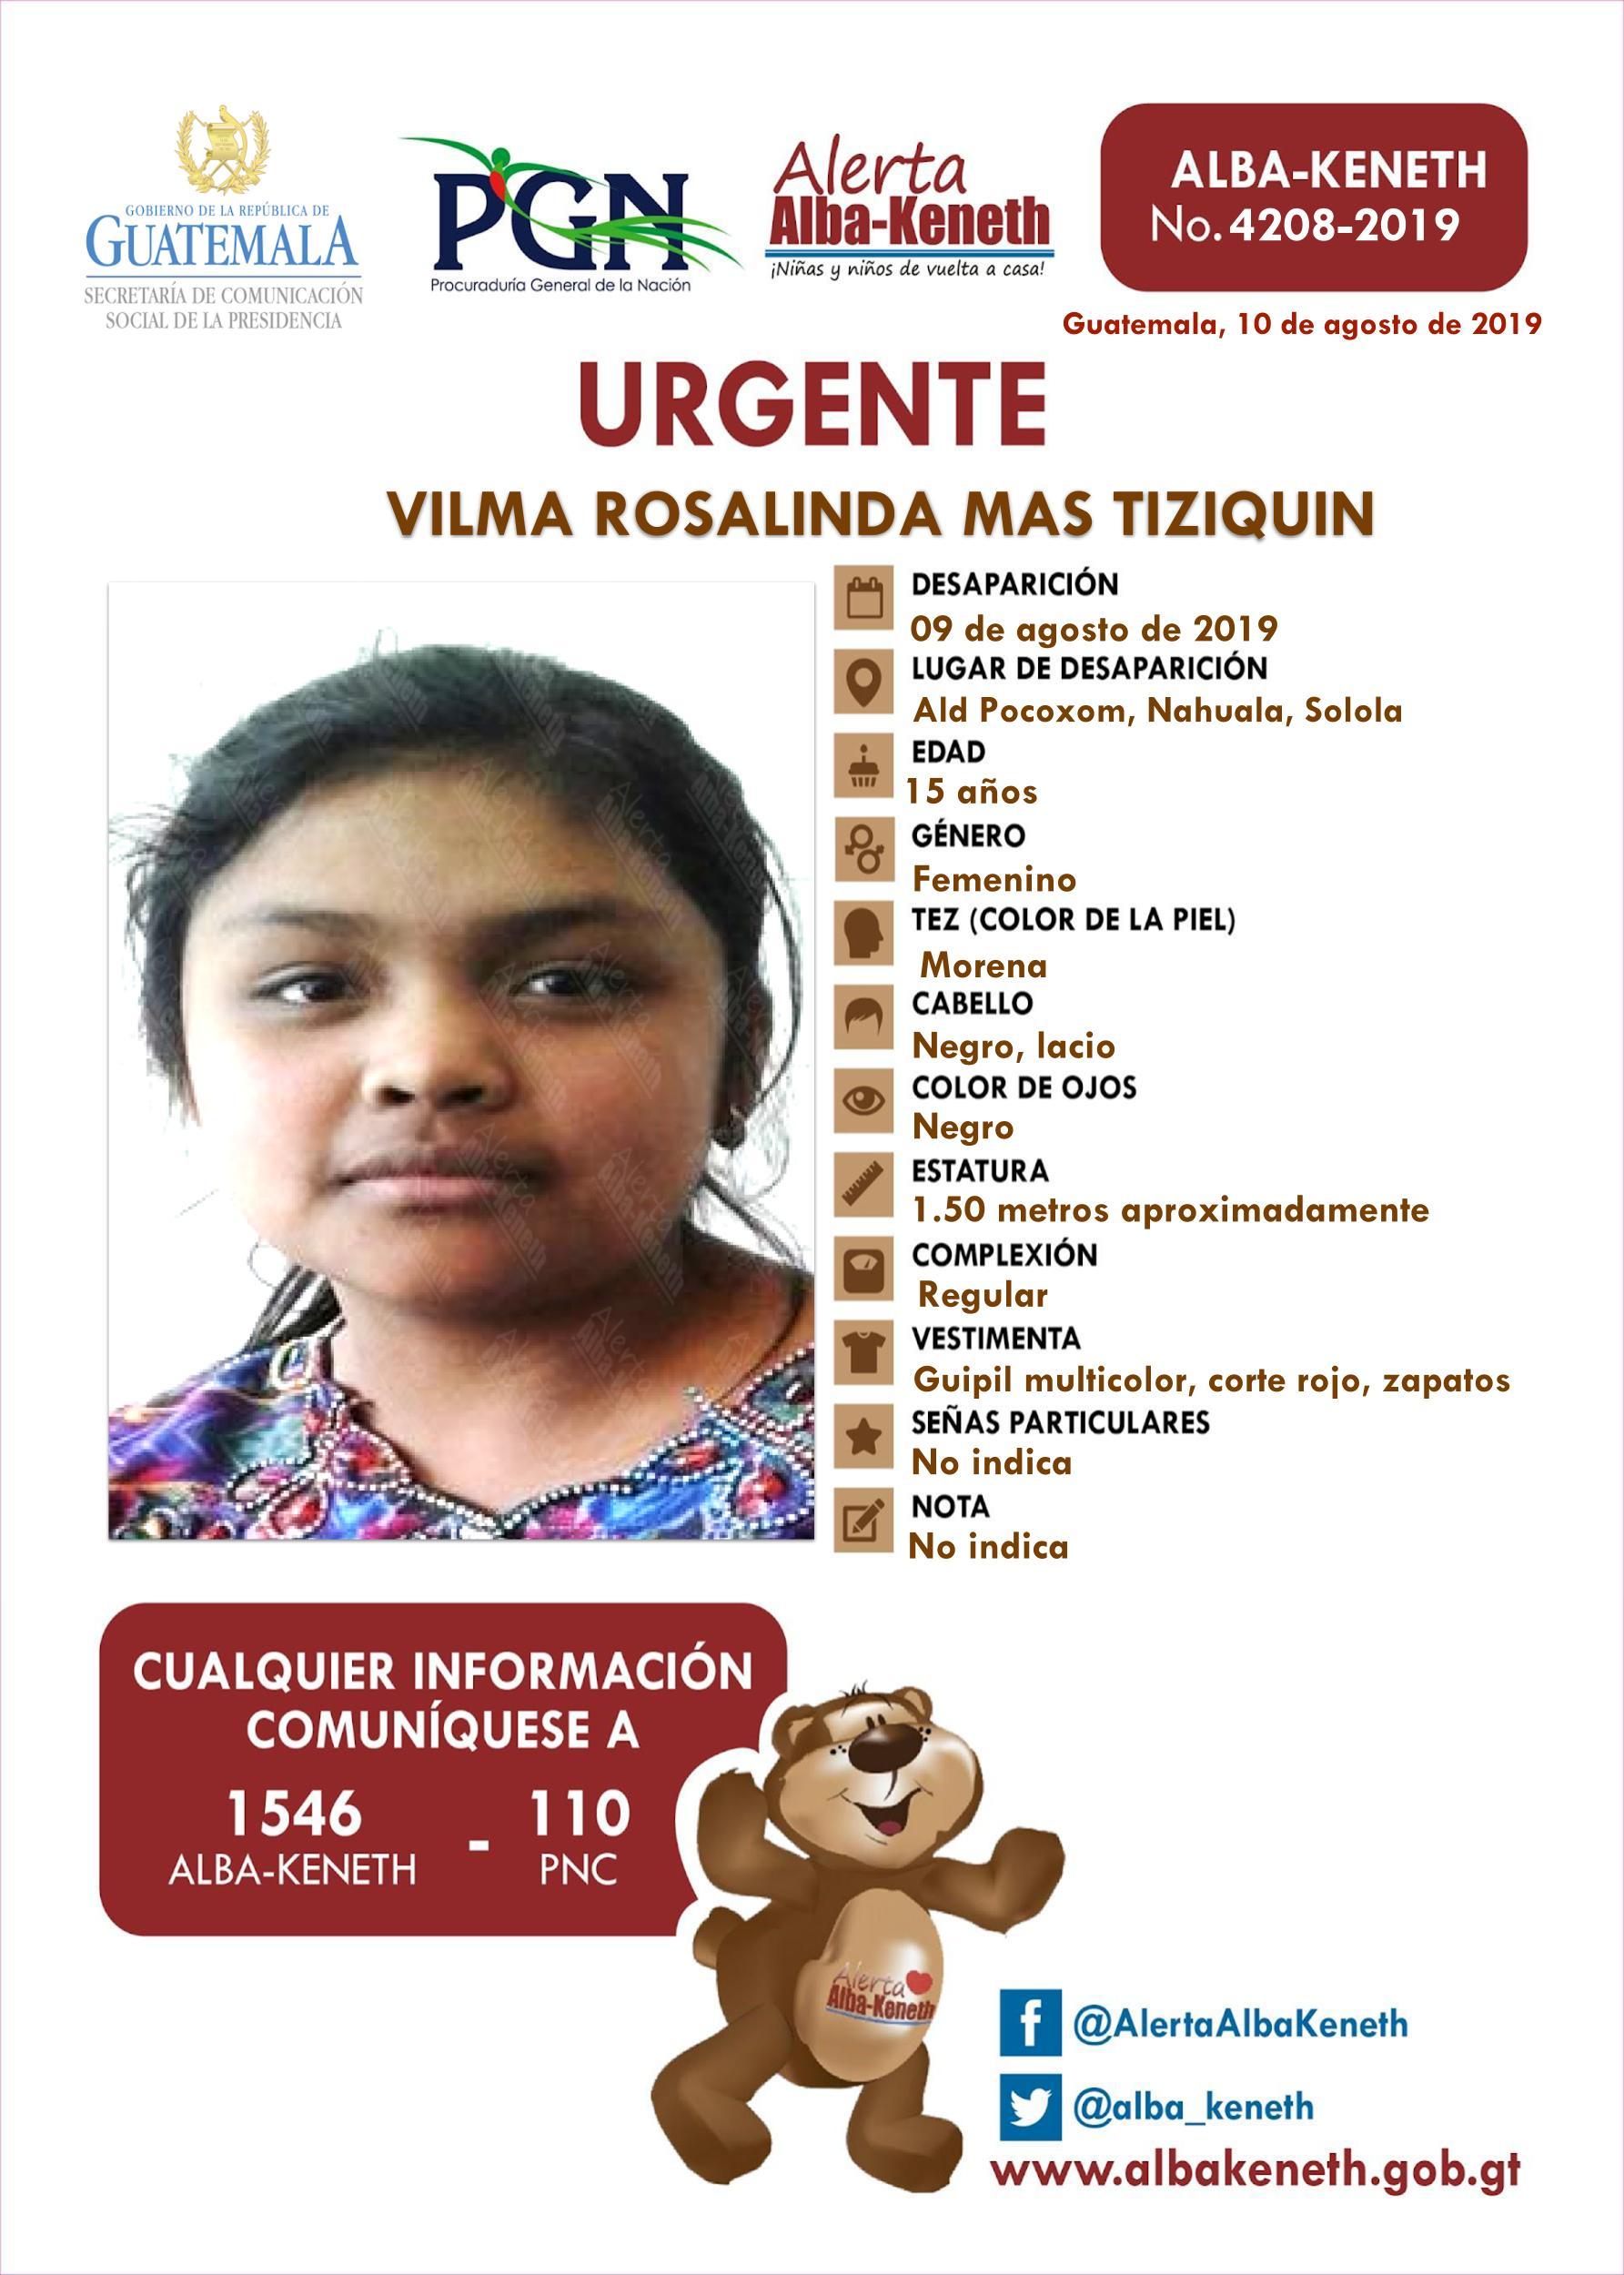 Vilma Rosalinda Mas Tiziquin